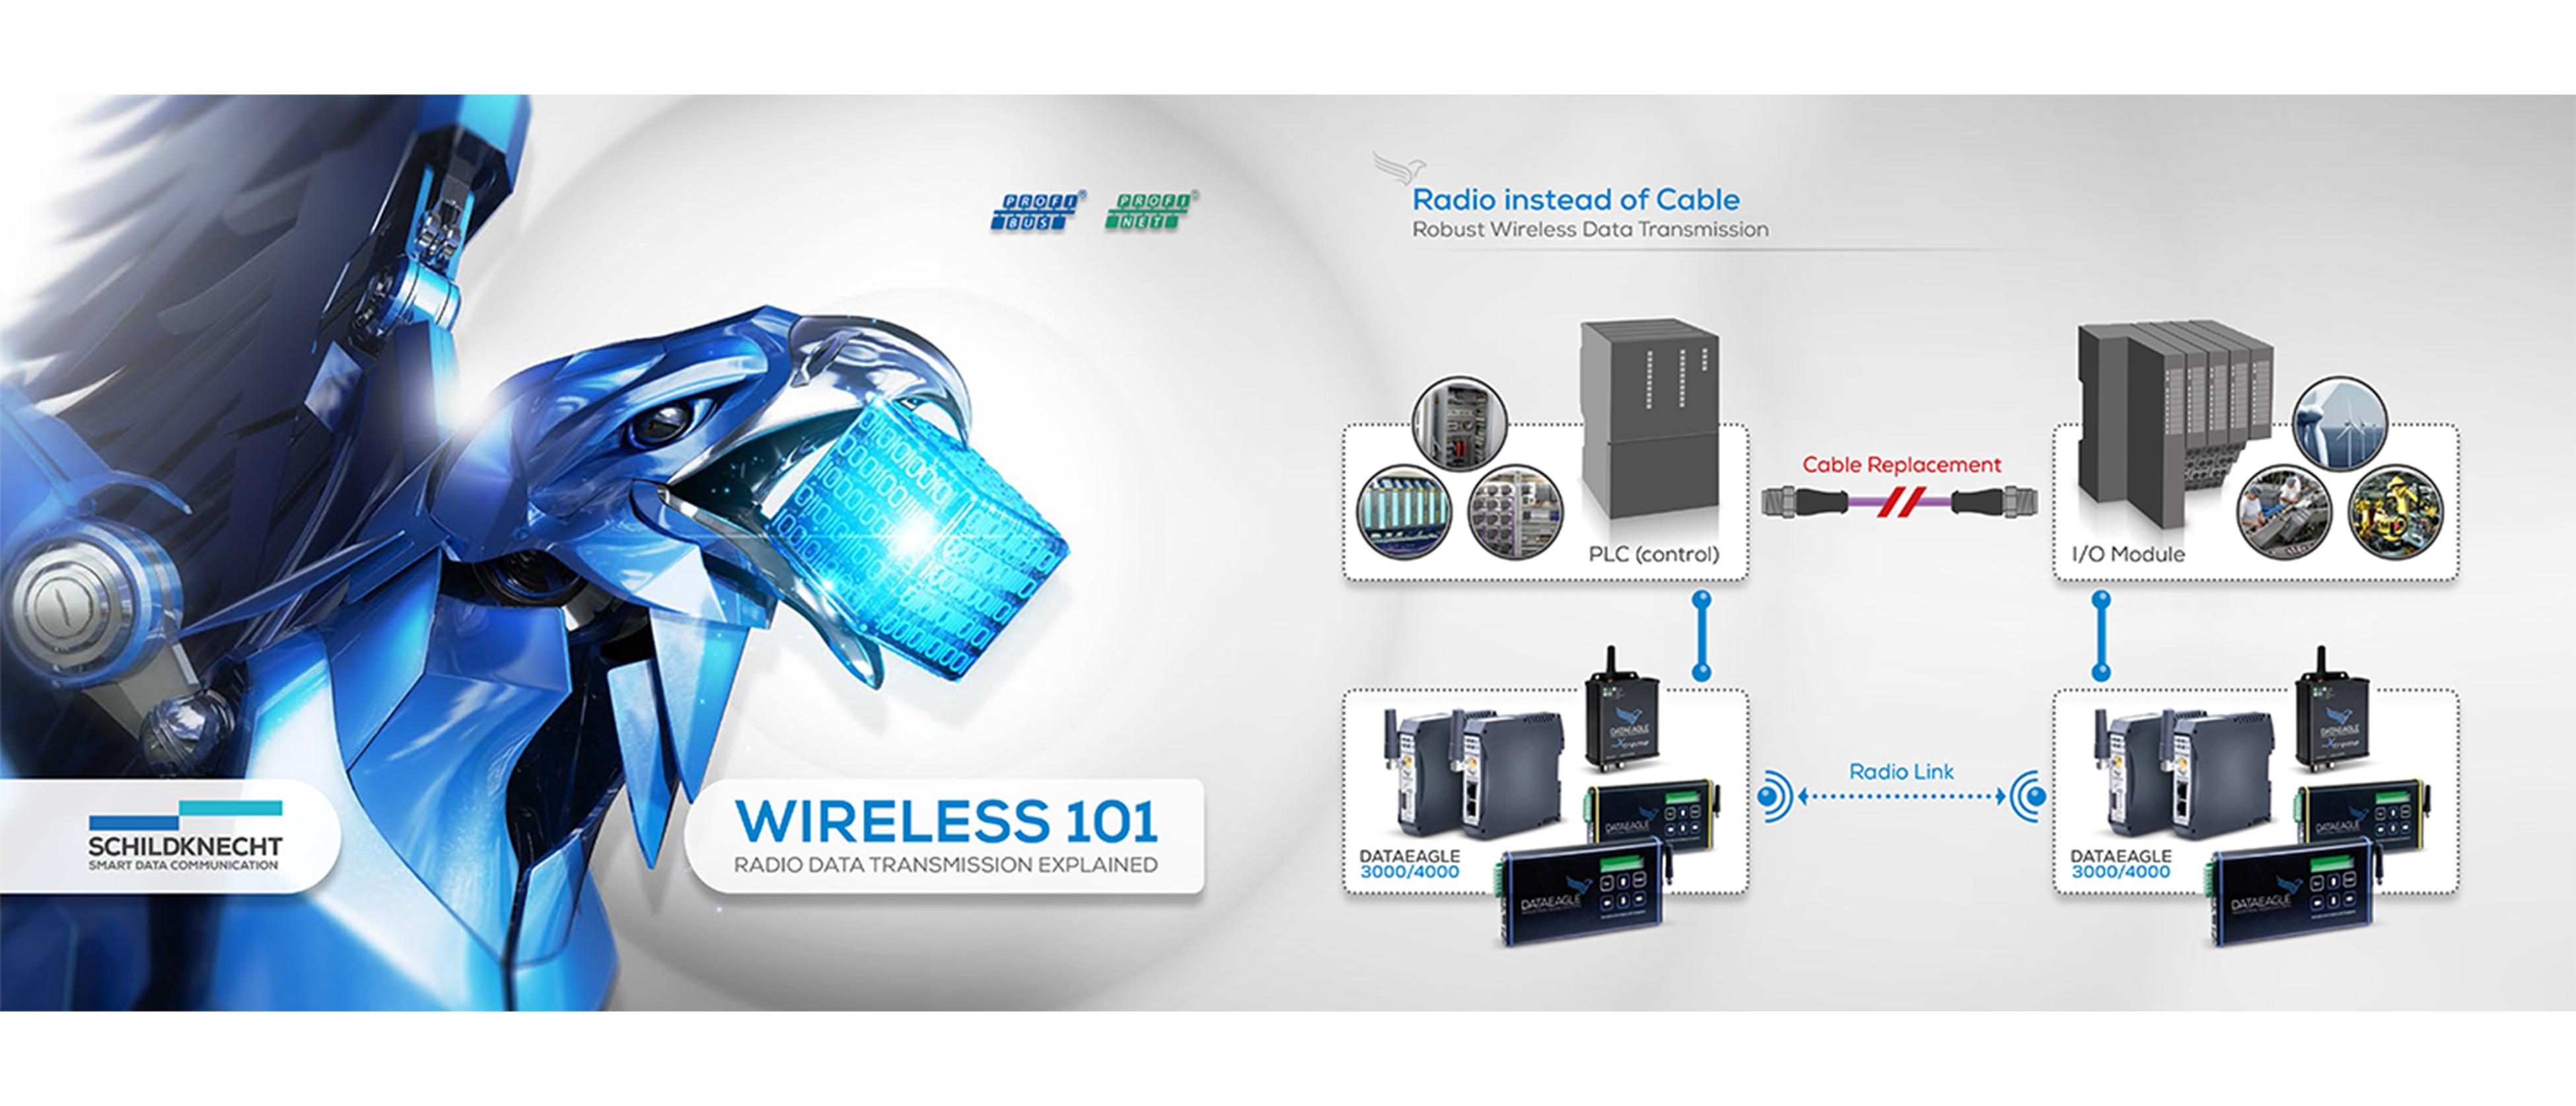 Wireless Data Transmission DataEagle by Schildknecht. Using Profibus & Profinet technology, IoT.